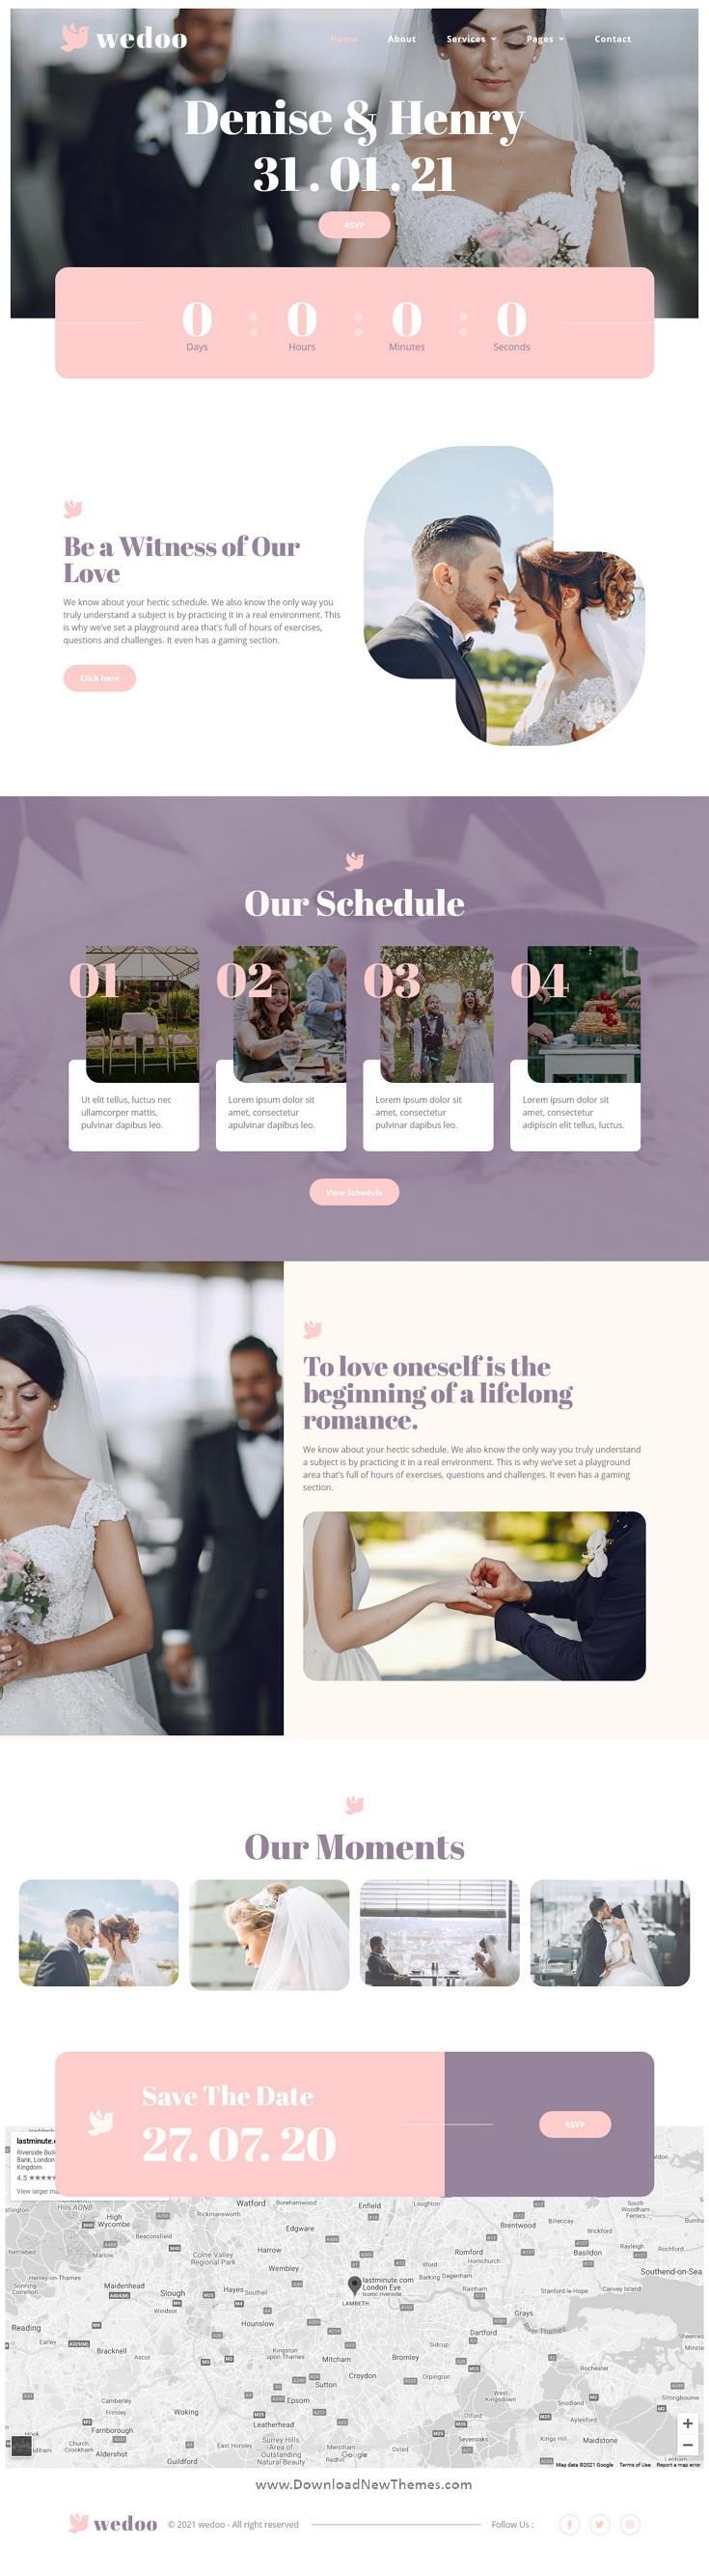 Online Wedding Invitation Elementor Template Kit